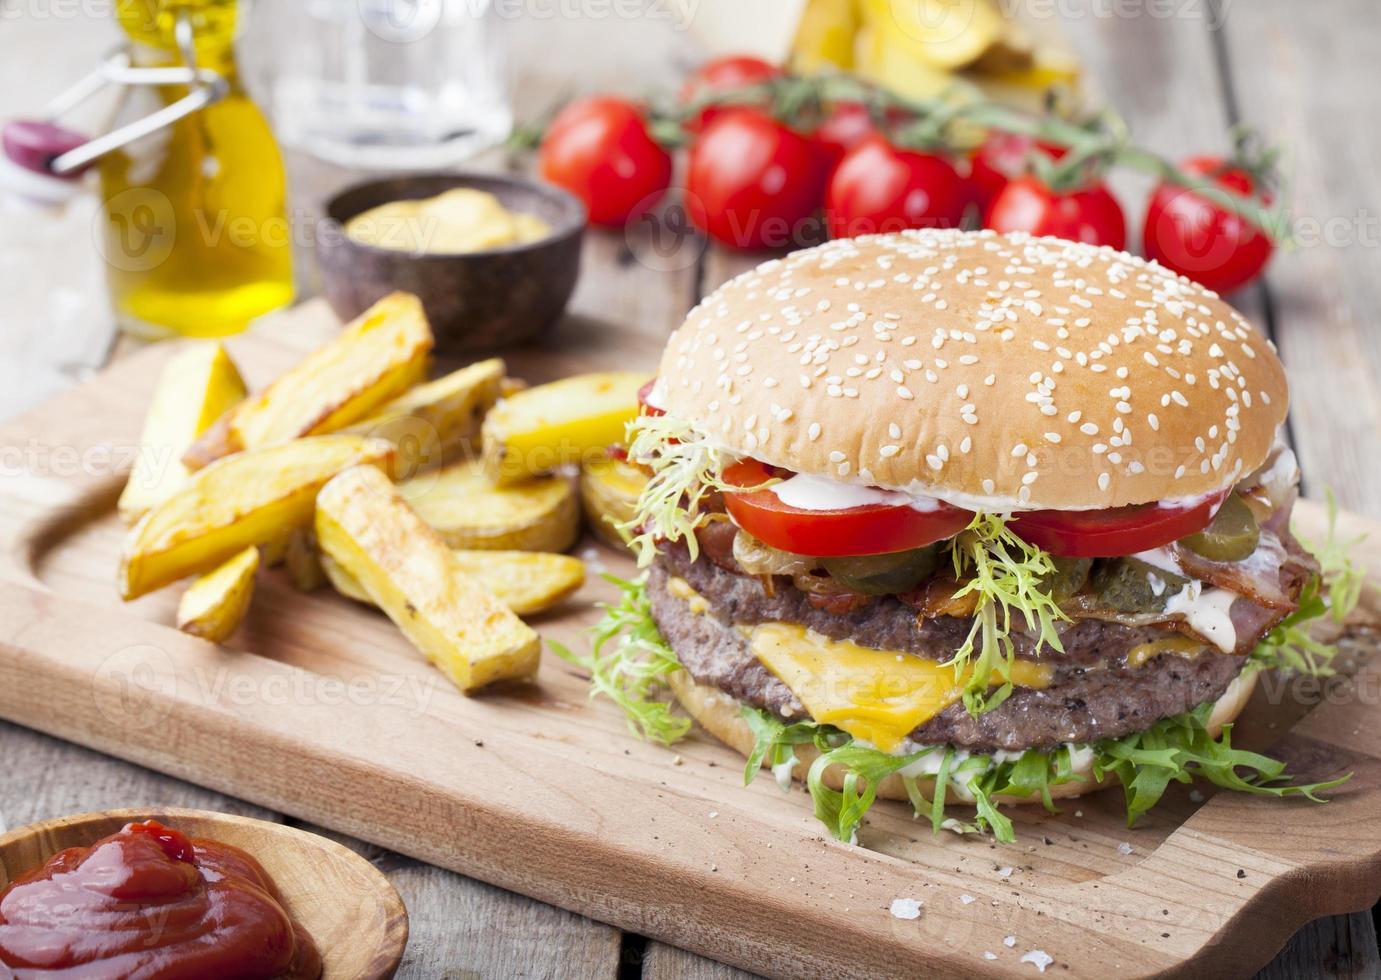 Burger, hamburger with frech fries, ketchup, mustard and fresh vegetables photo